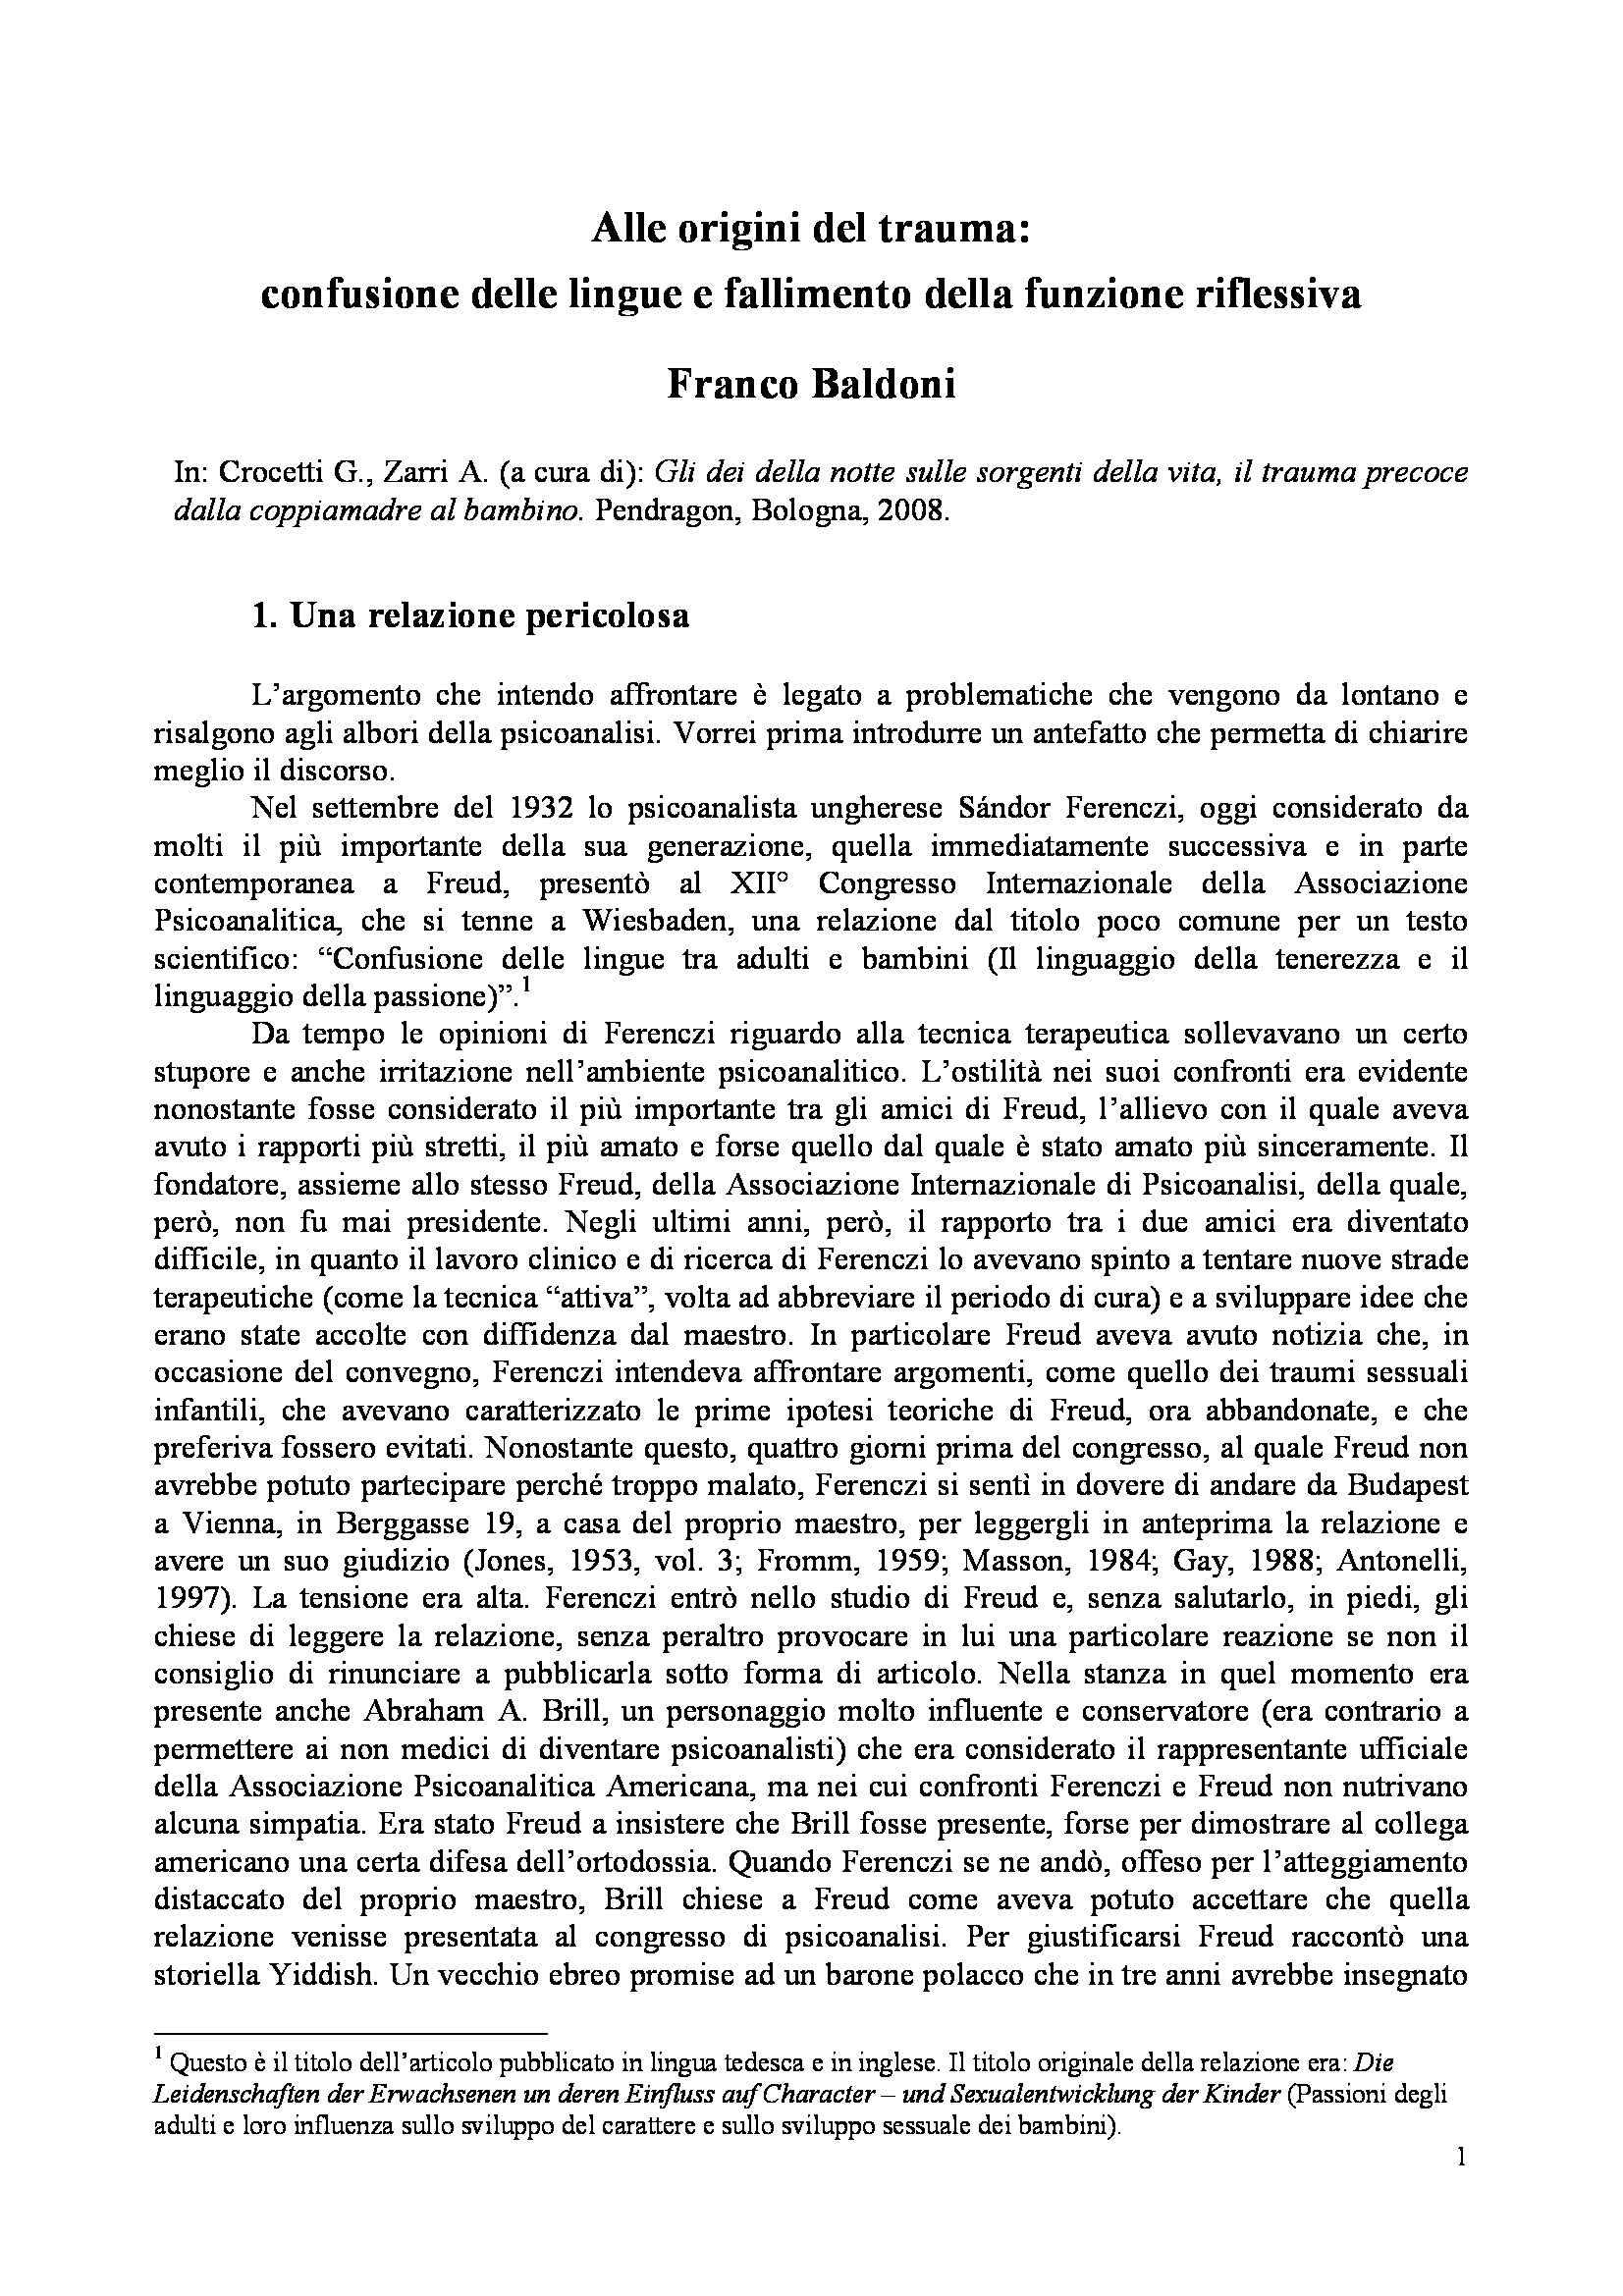 dispensa F. Baldoni METODOLOGIA CLINICA I